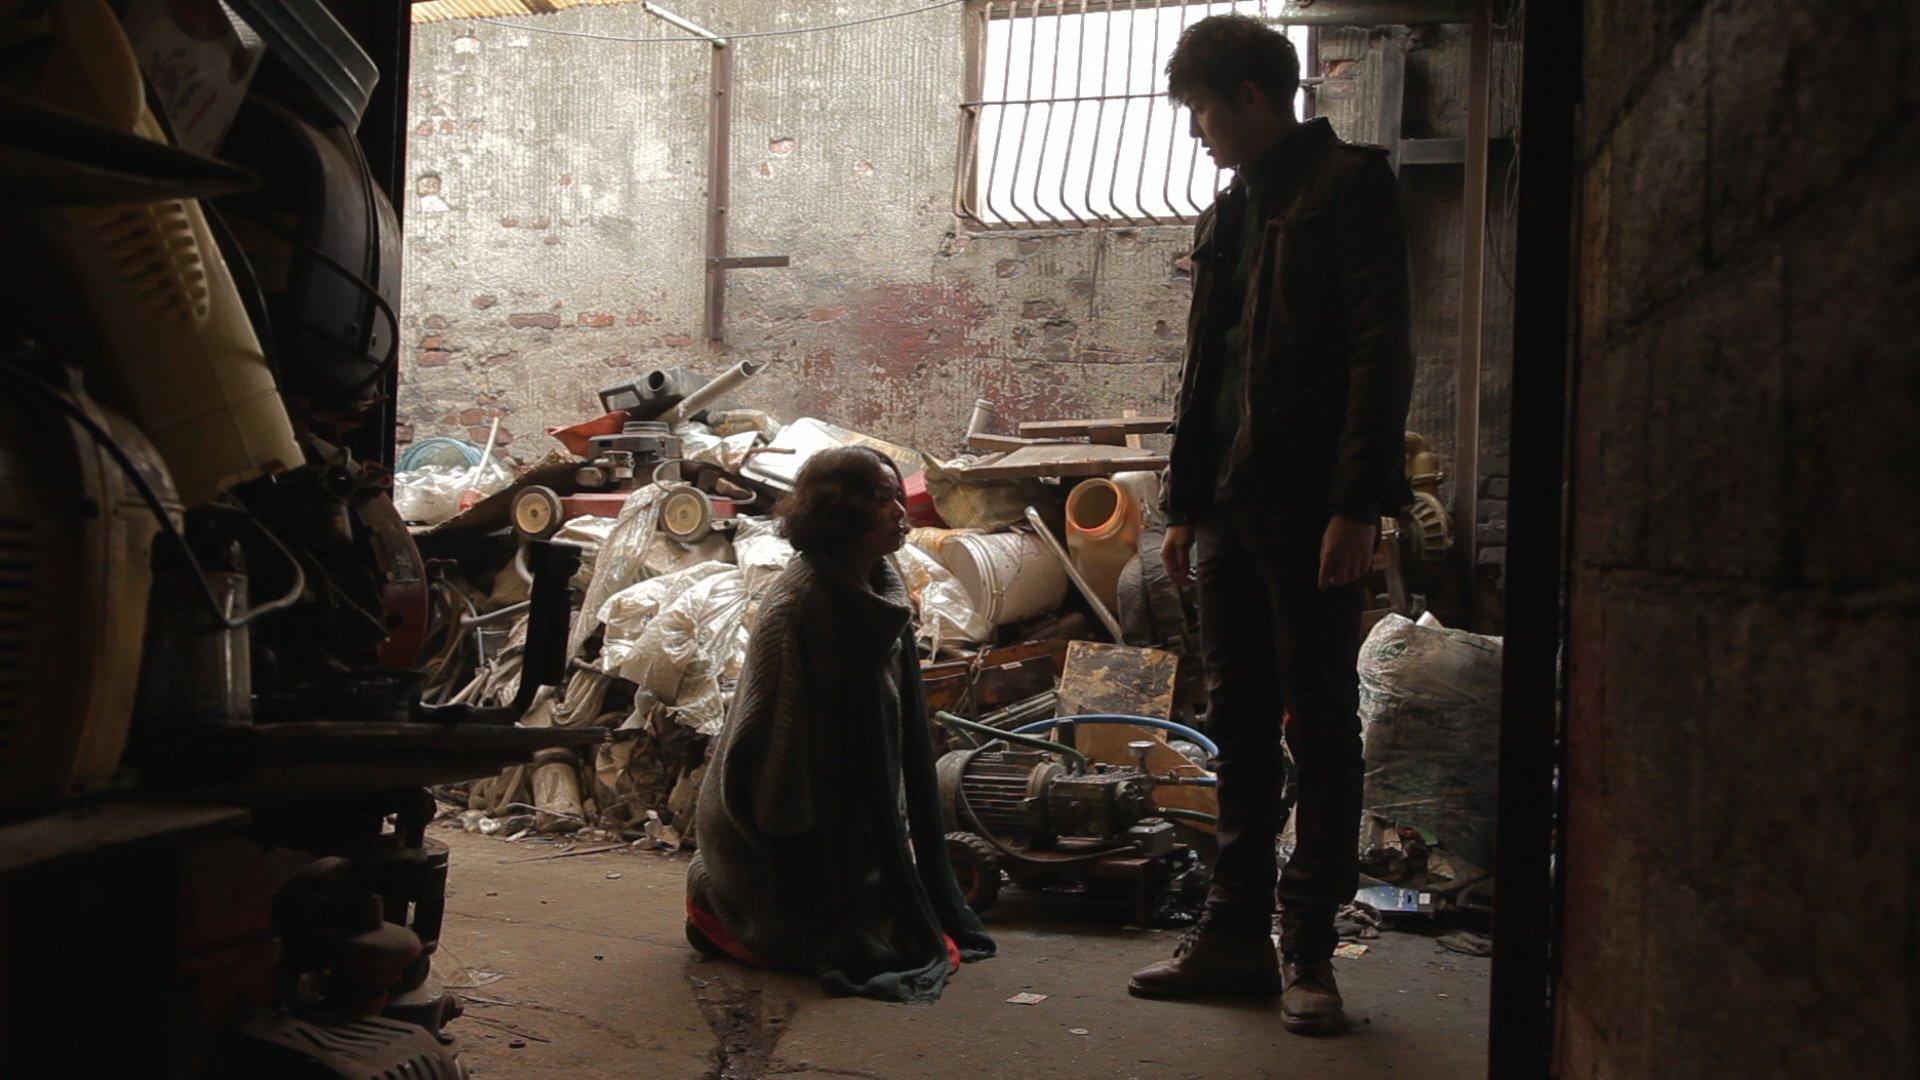 Pieta - DC FilmdomDC Filmdom   Entertainment reviews by ...